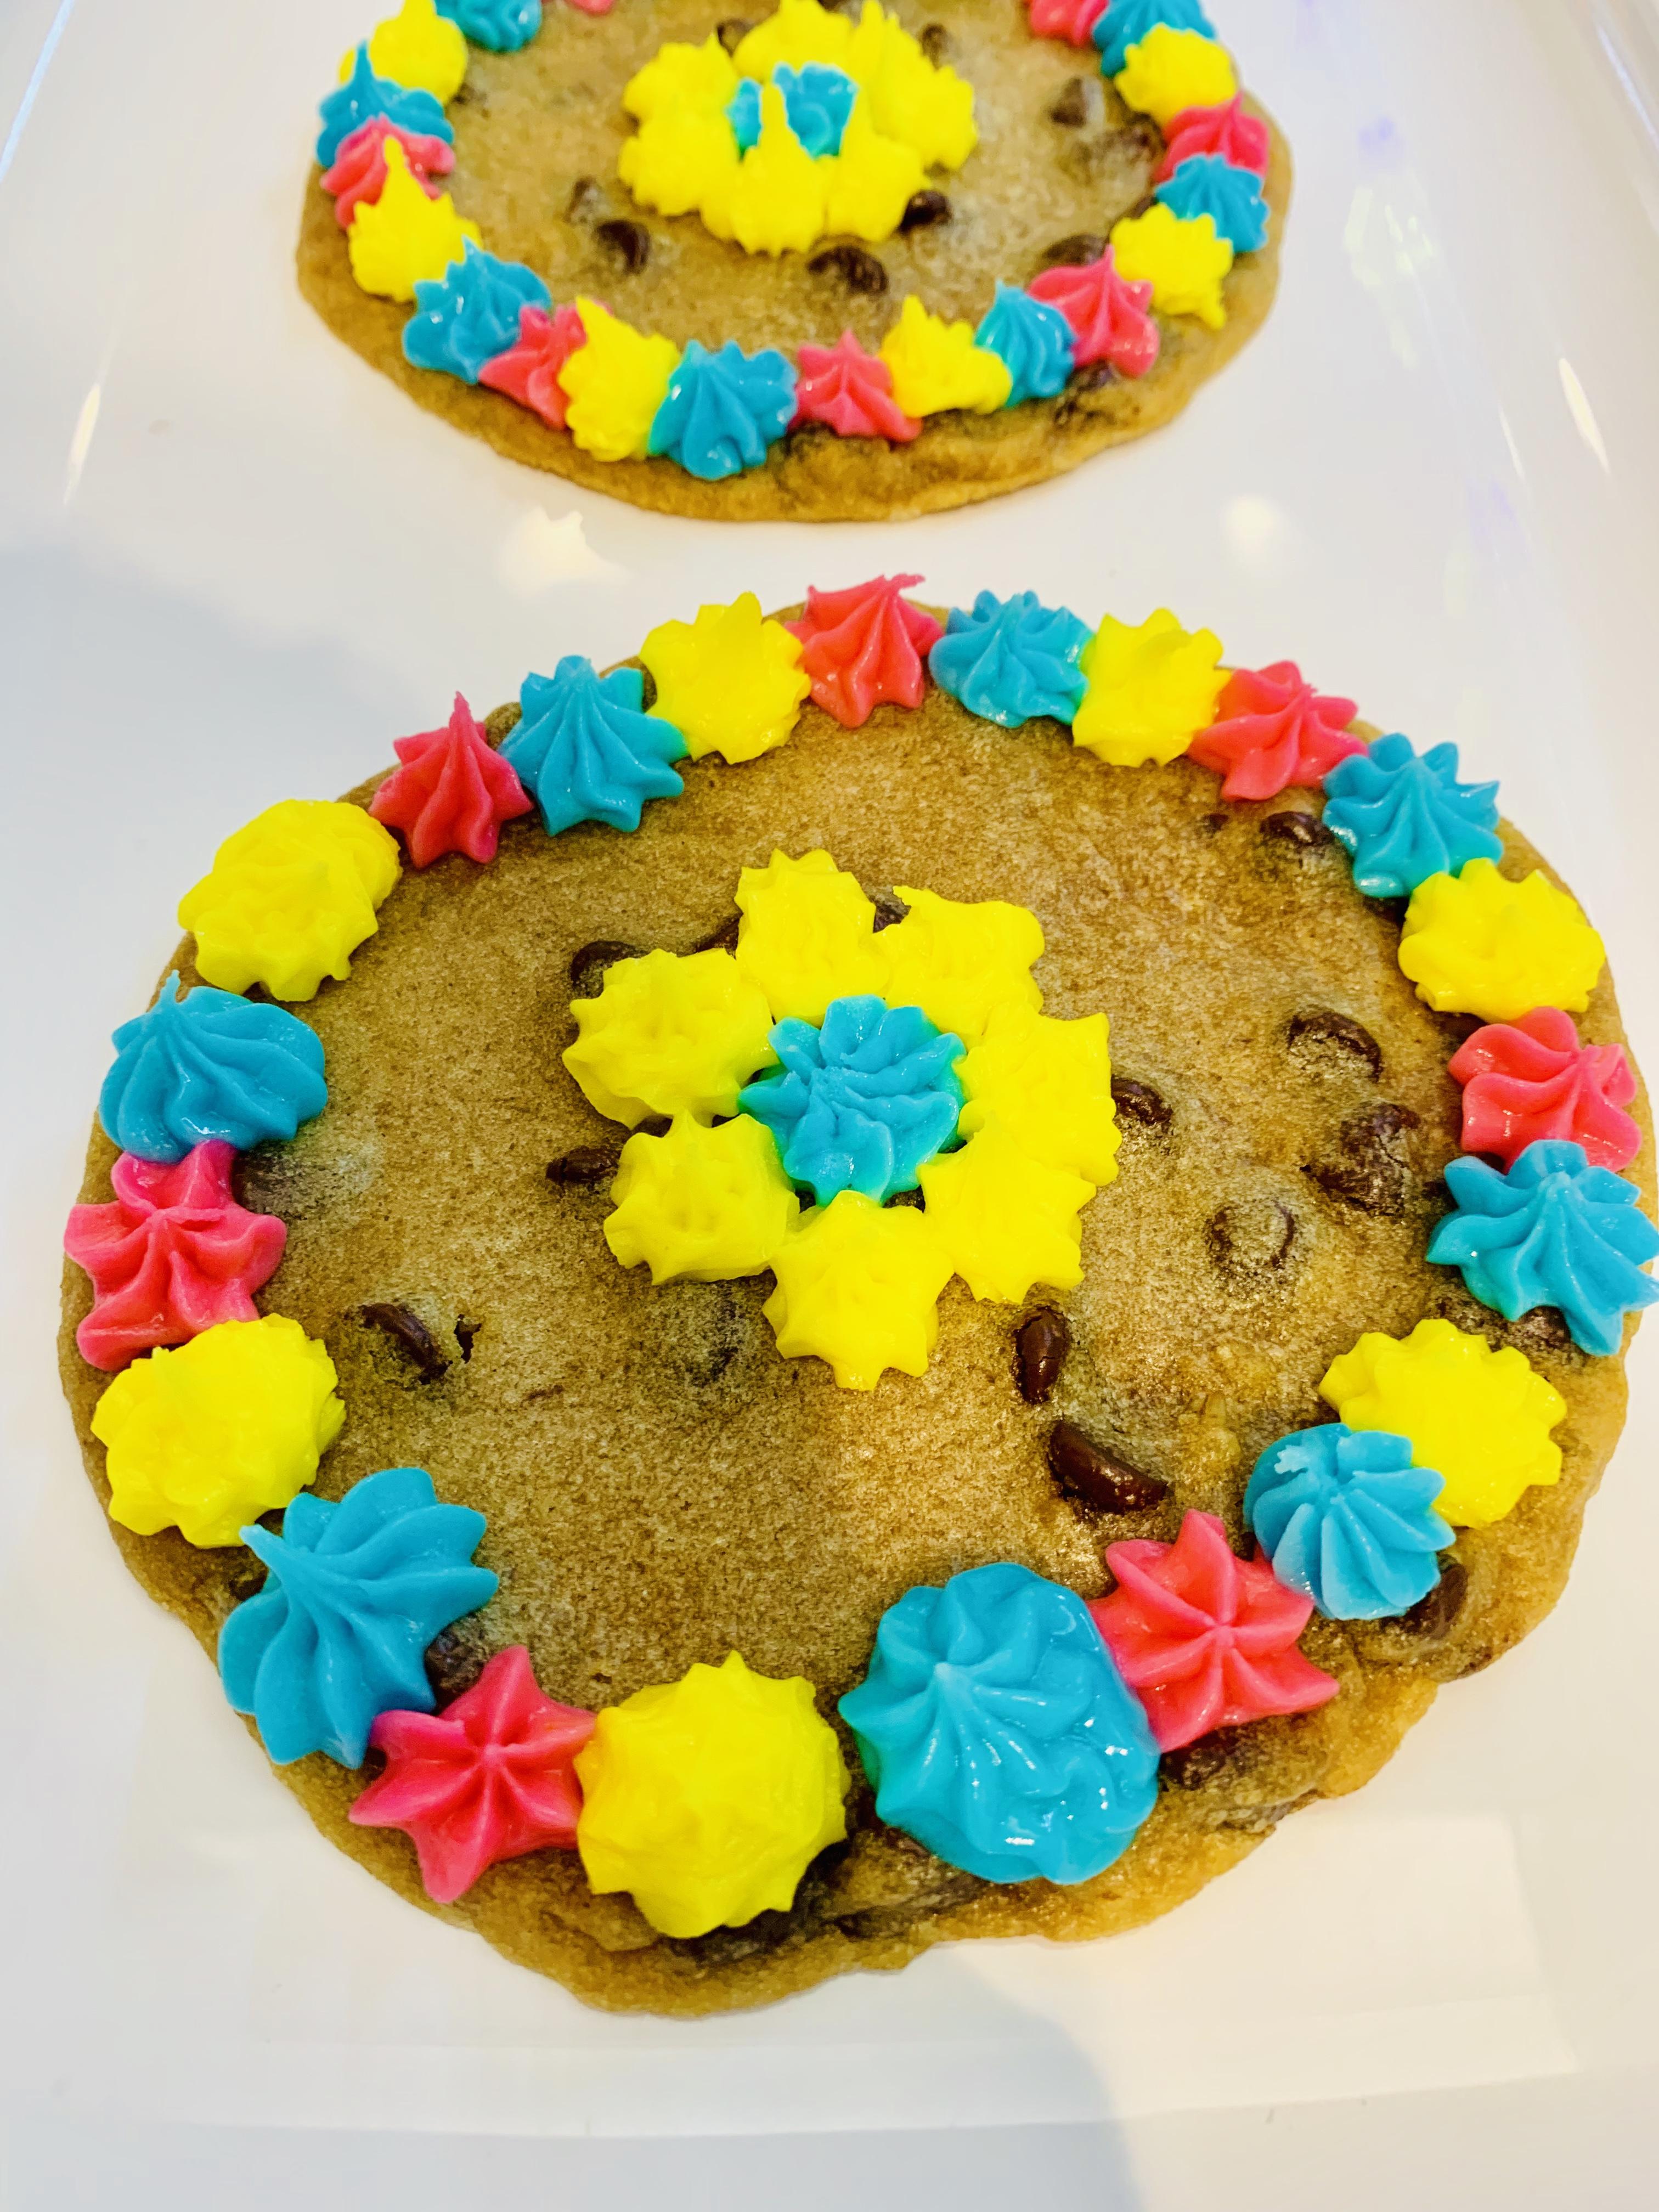 https://0201.nccdn.net/4_2/000/000/082/8ea/Mini-Cookie-Cake-3024x4032.jpg